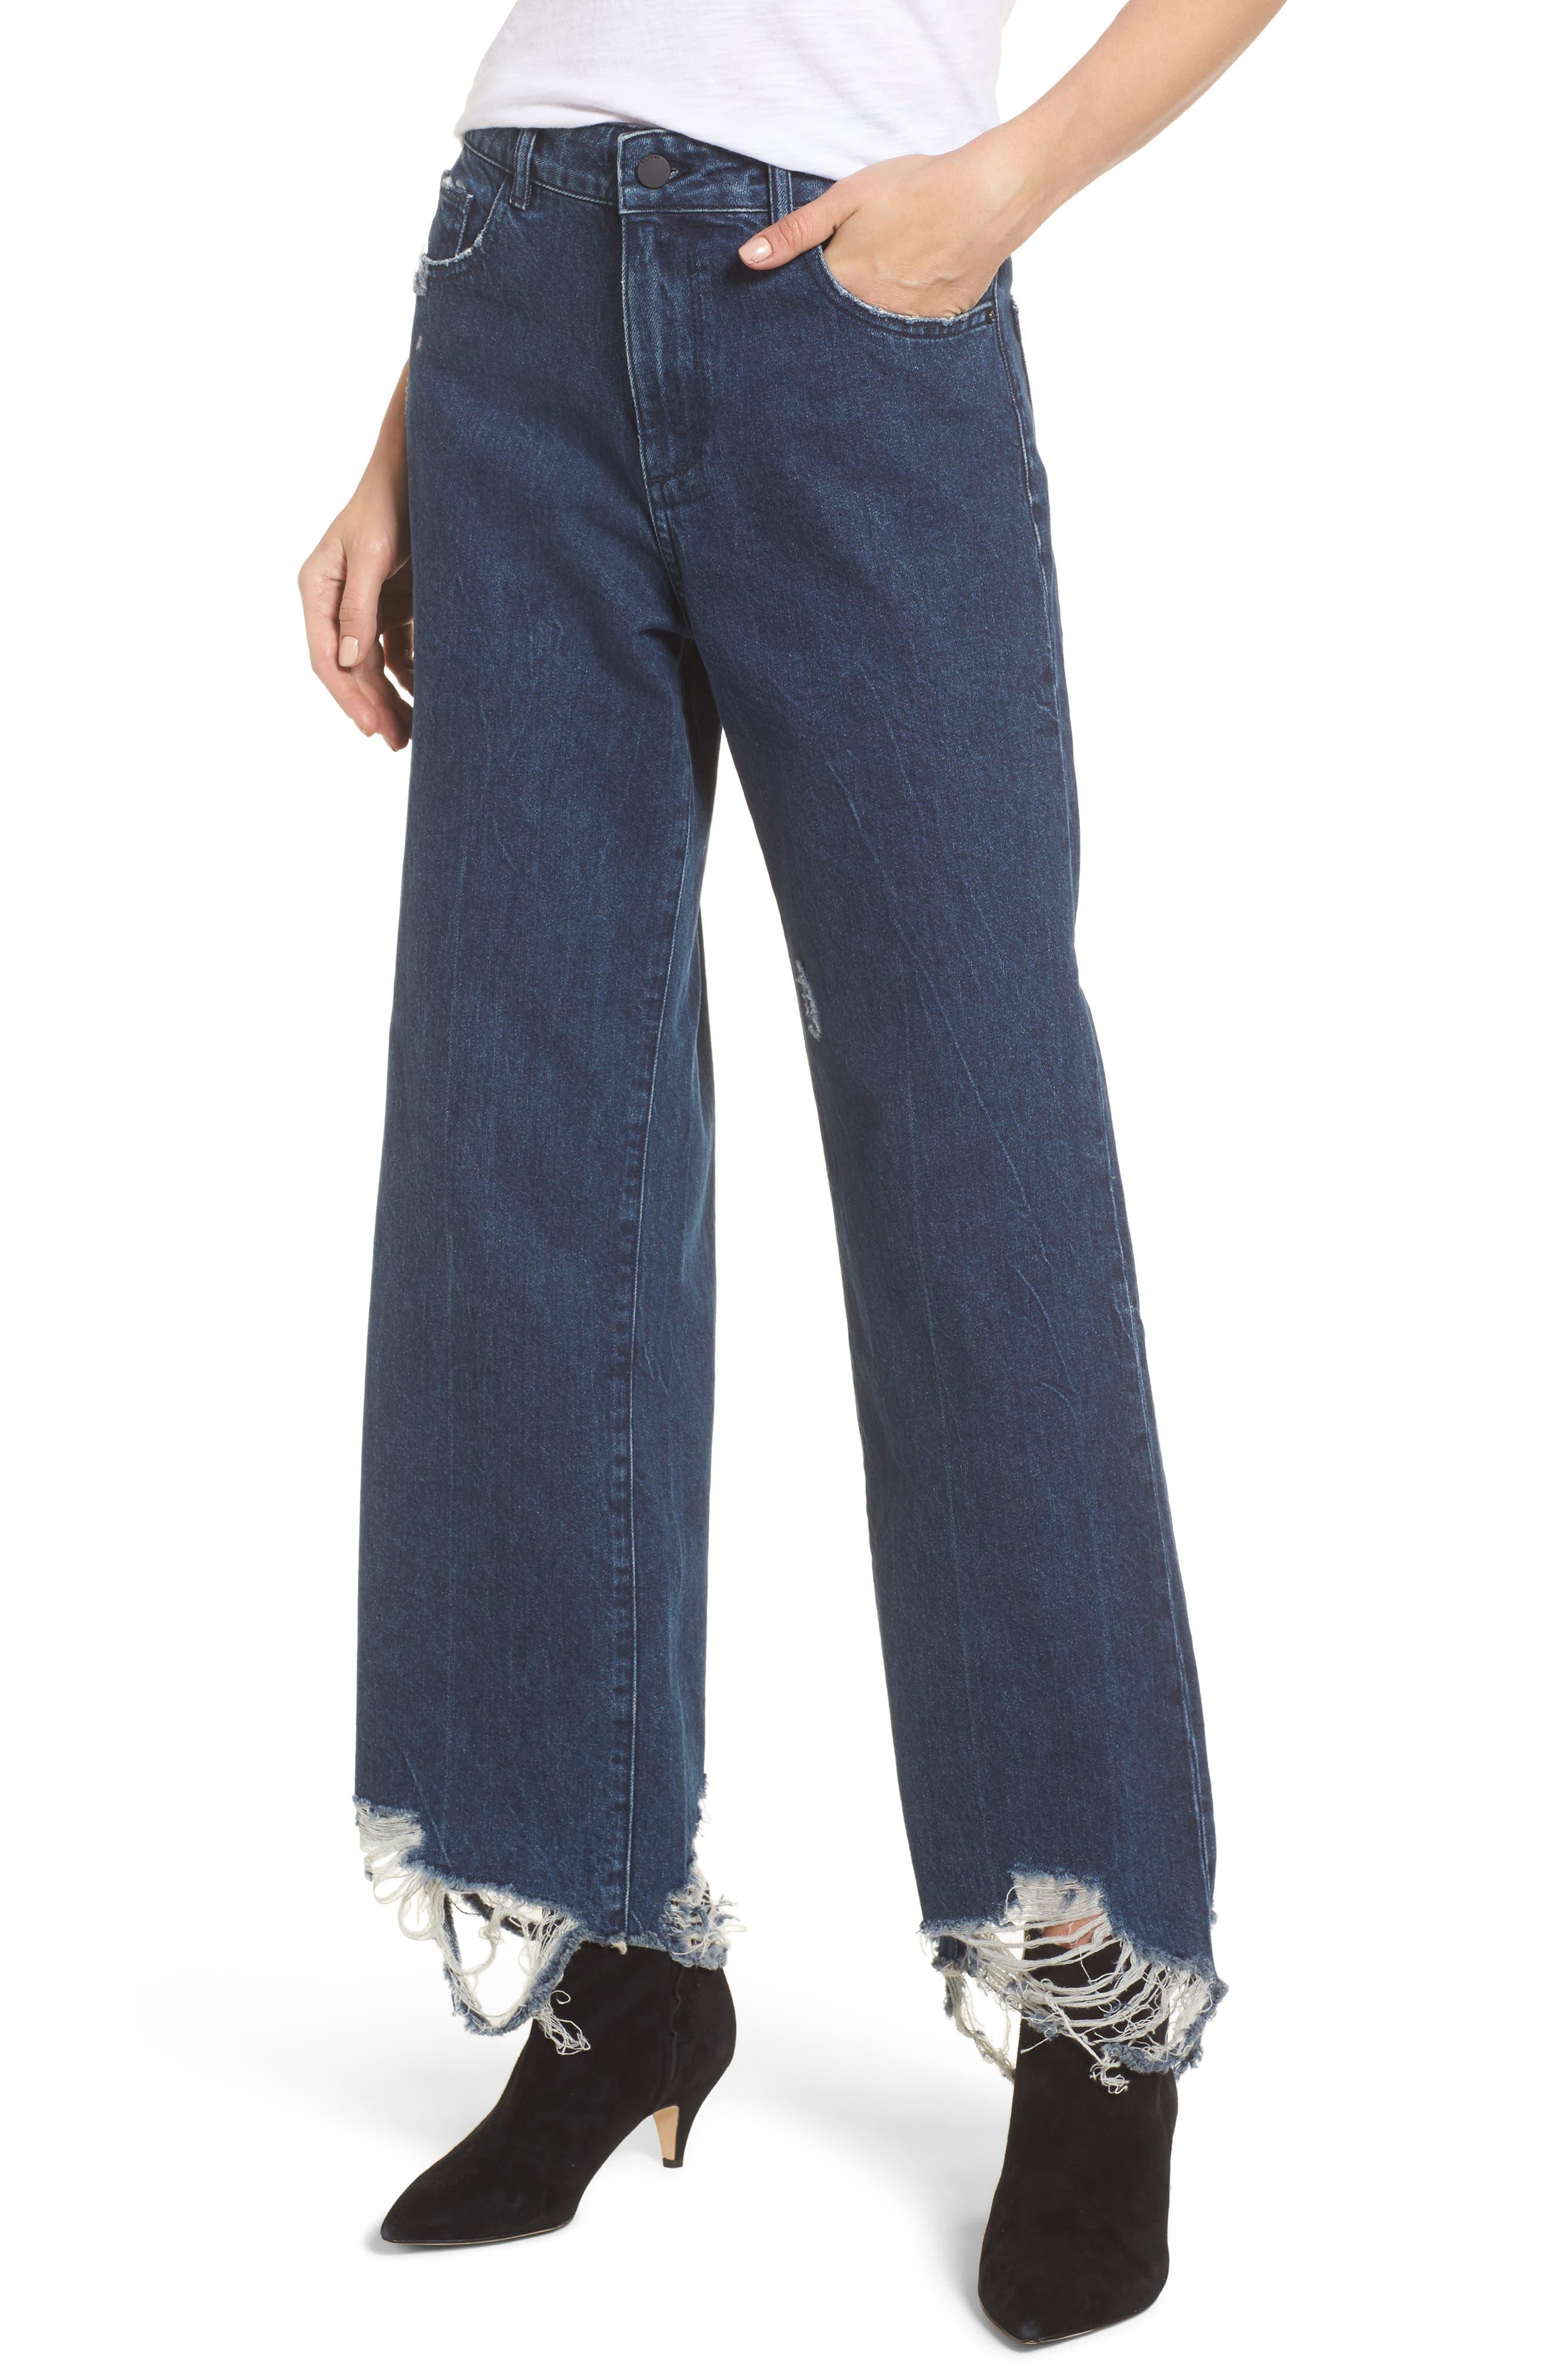 DL1961 Hepburn High Waist Wide Leg Jeans (Industry)